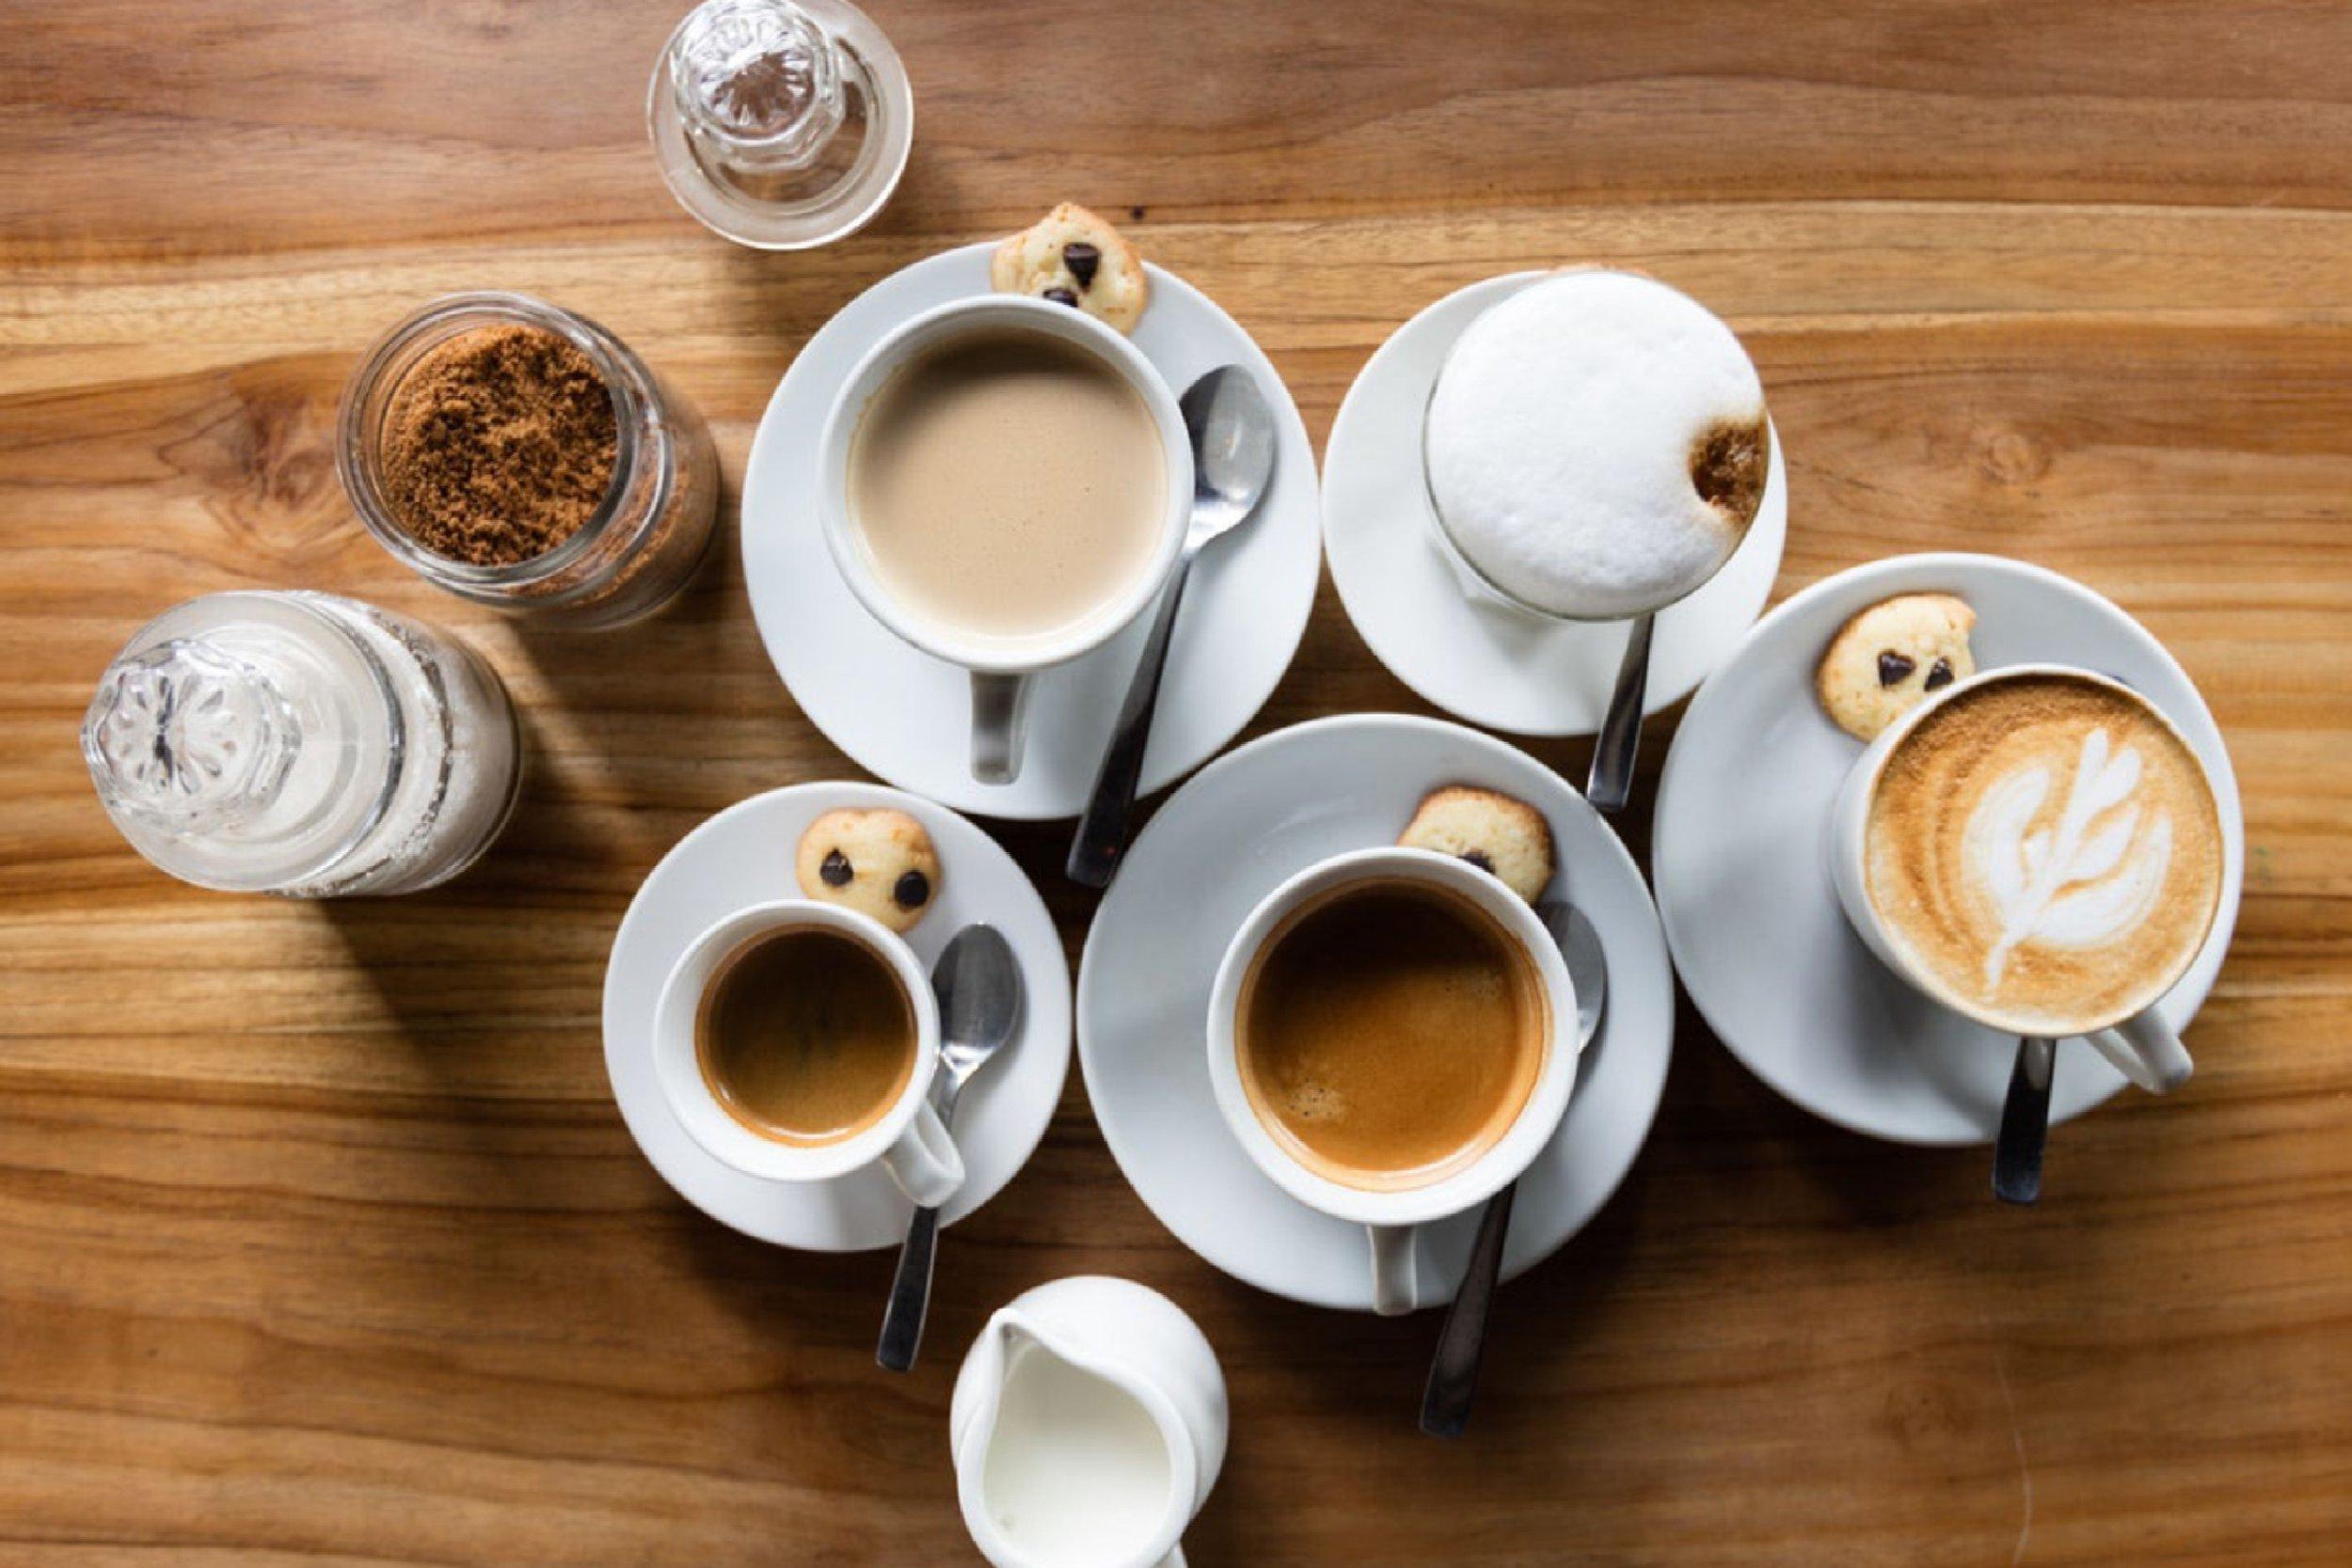 Cups-of-coffee-flatlay